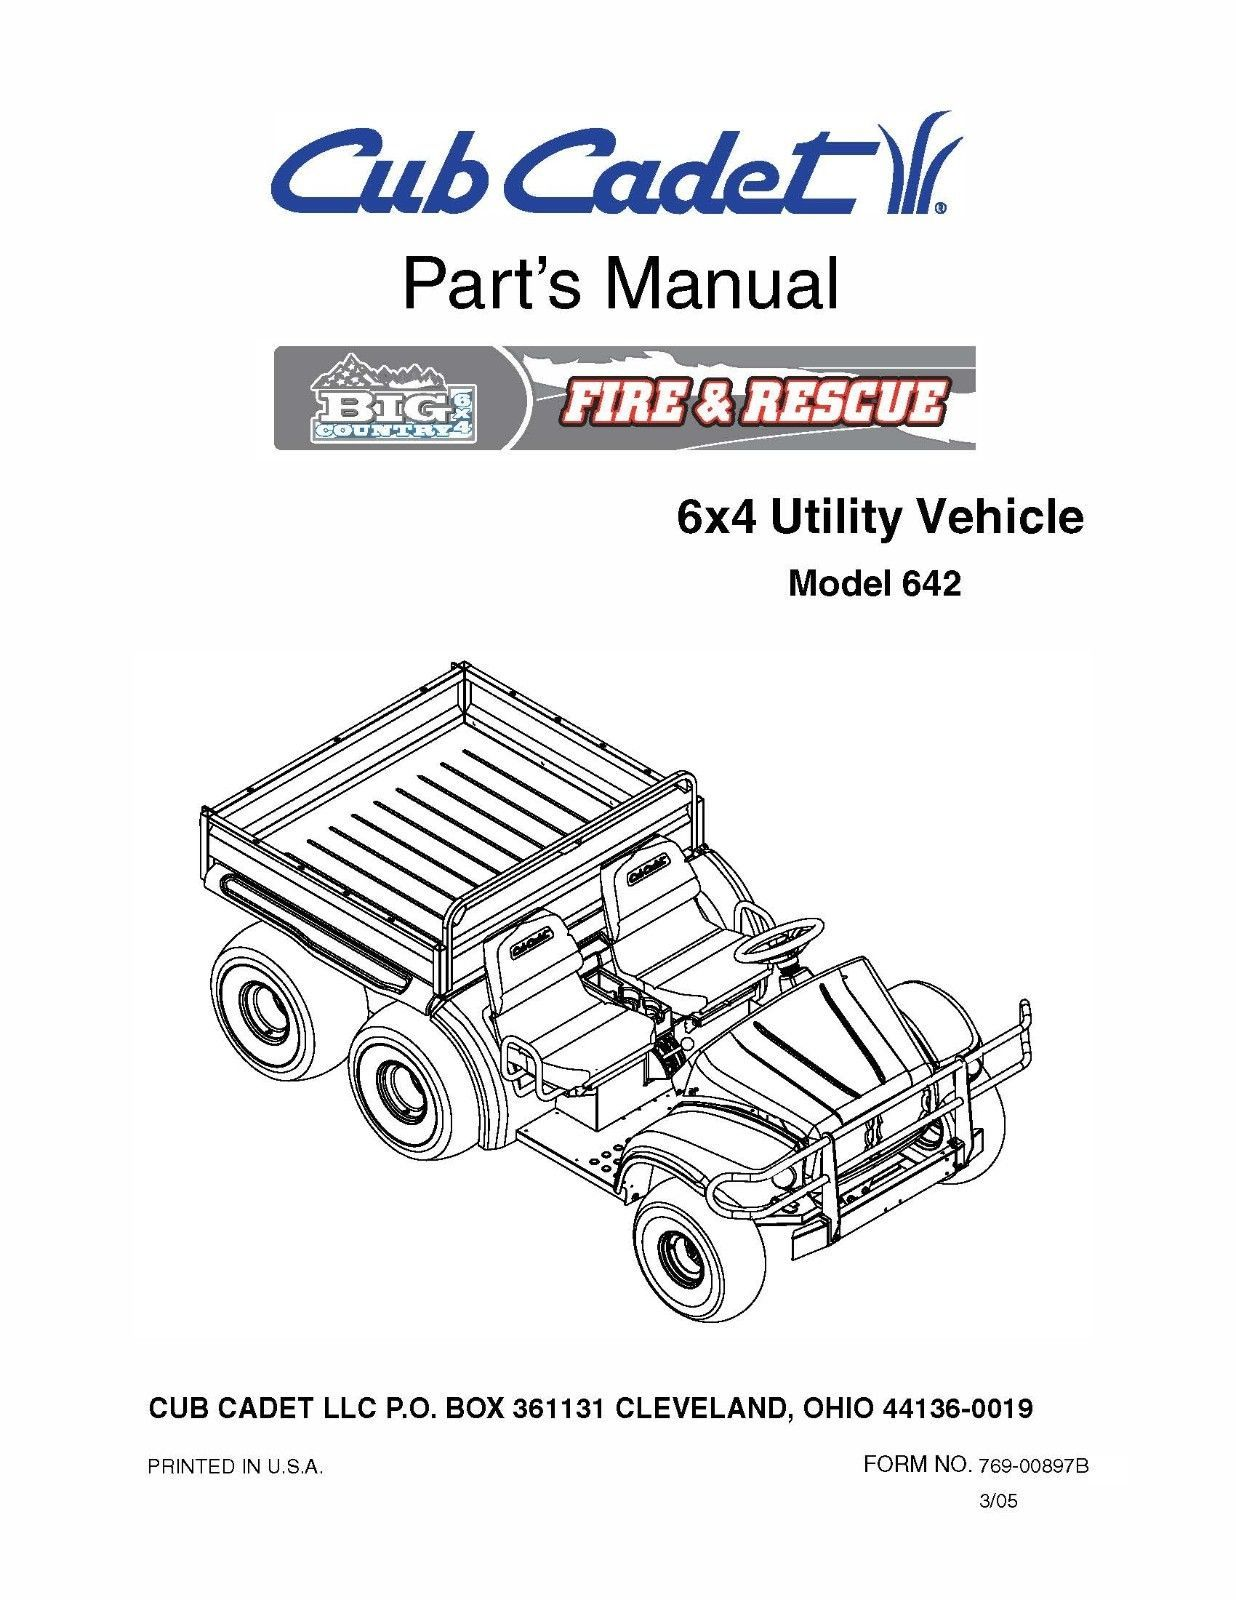 Cub Cadet Big Country 6x4 utility vehicle Parts Manual No. 642